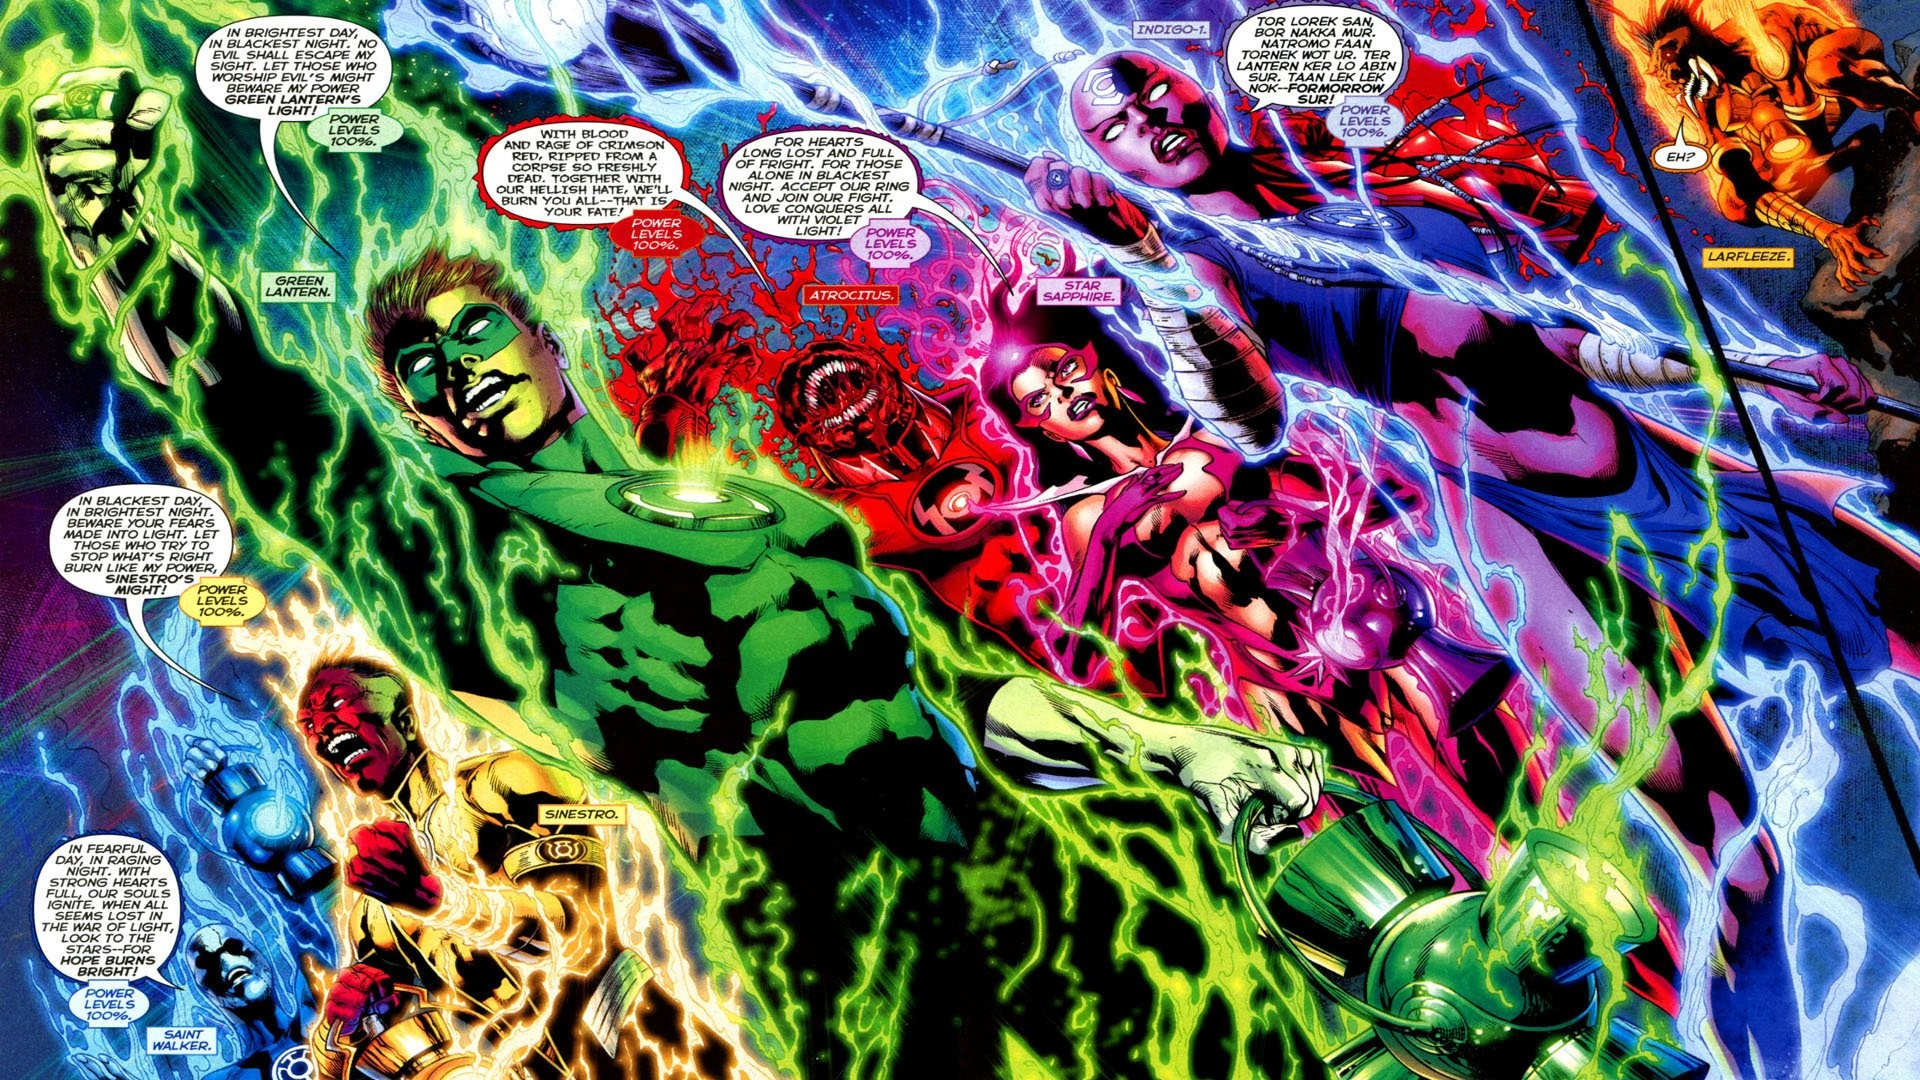 Res: 1920x1080, Comics - Blackest Night Green Lantern Red Lantern Wallpaper